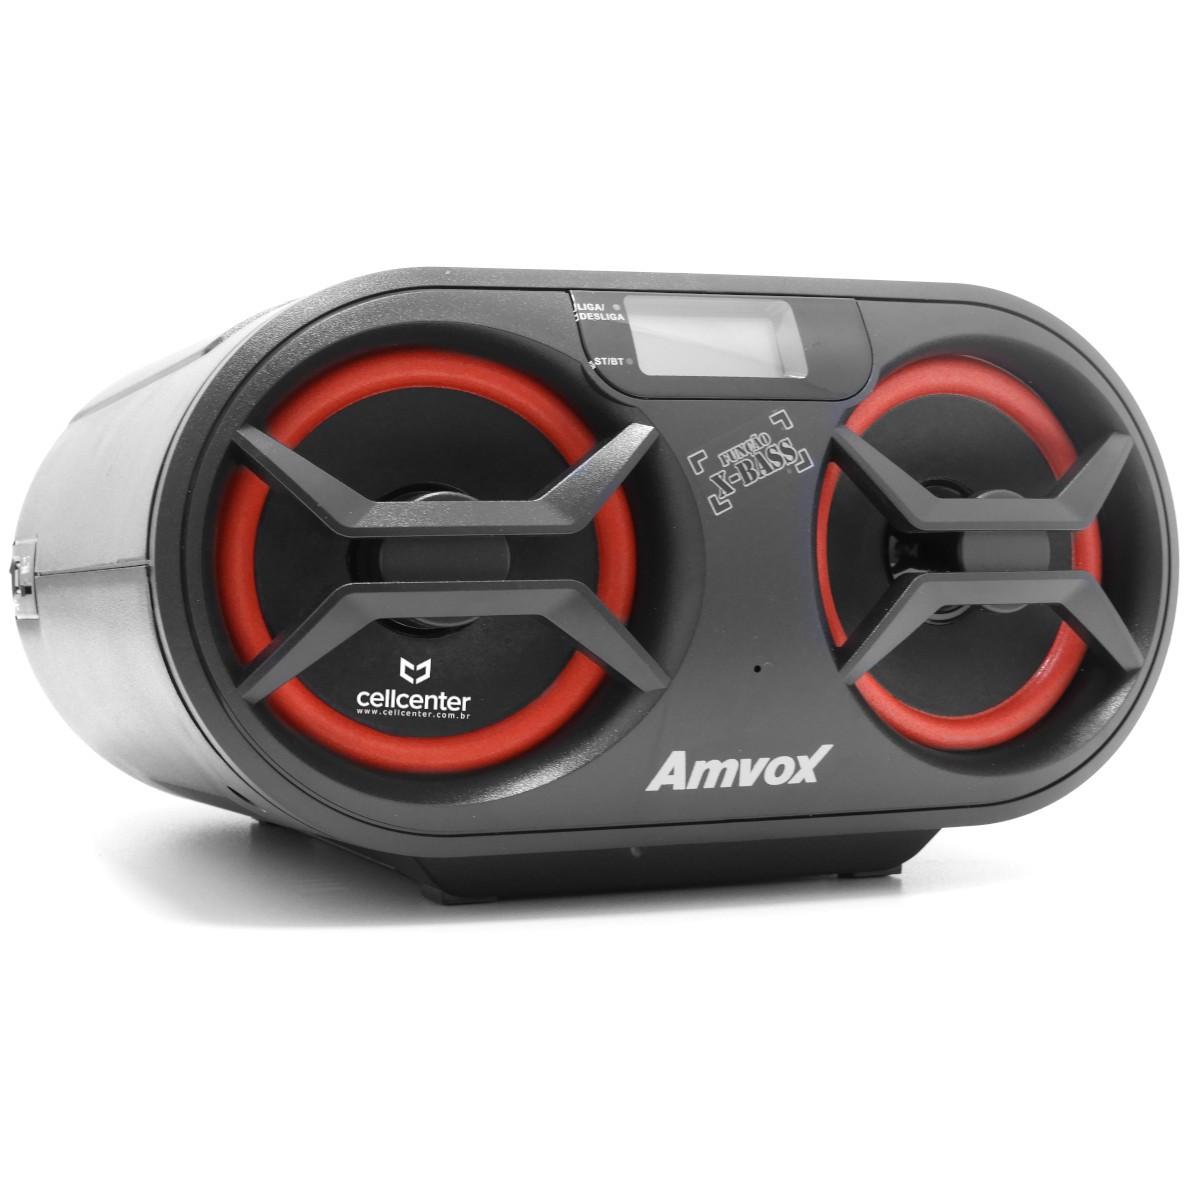 Rádio Portátil Boombox Som Cd Mp3 Player Usb Sd Fm Am Bluetooth Bivolt Amvox AMC-590 New